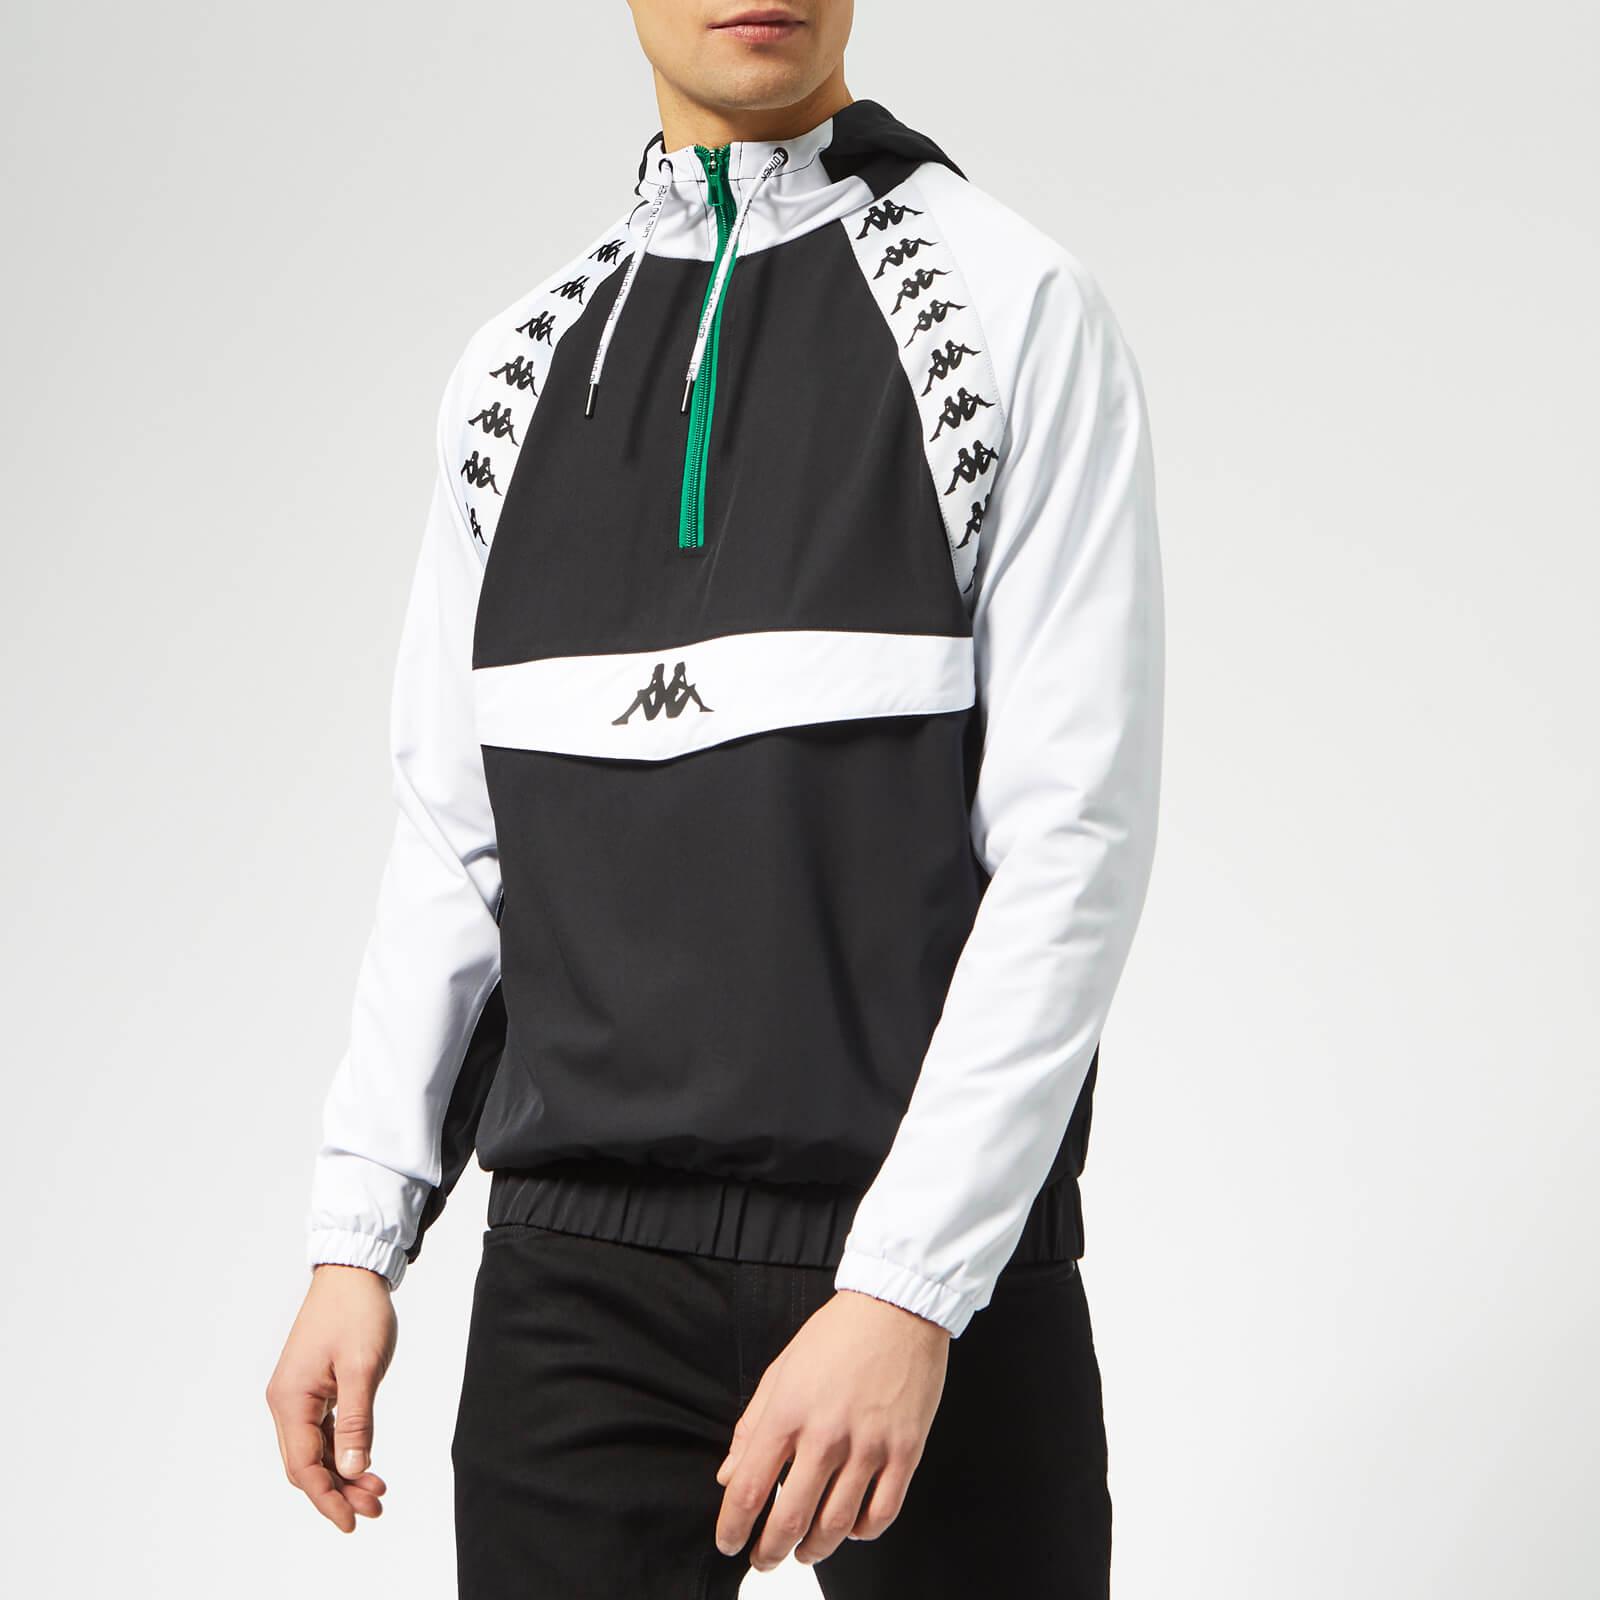 0dc9f83ea2 Kappa Men's Authentic Bakit Windbreaker Jacket - Black Clothing | TheHut.com